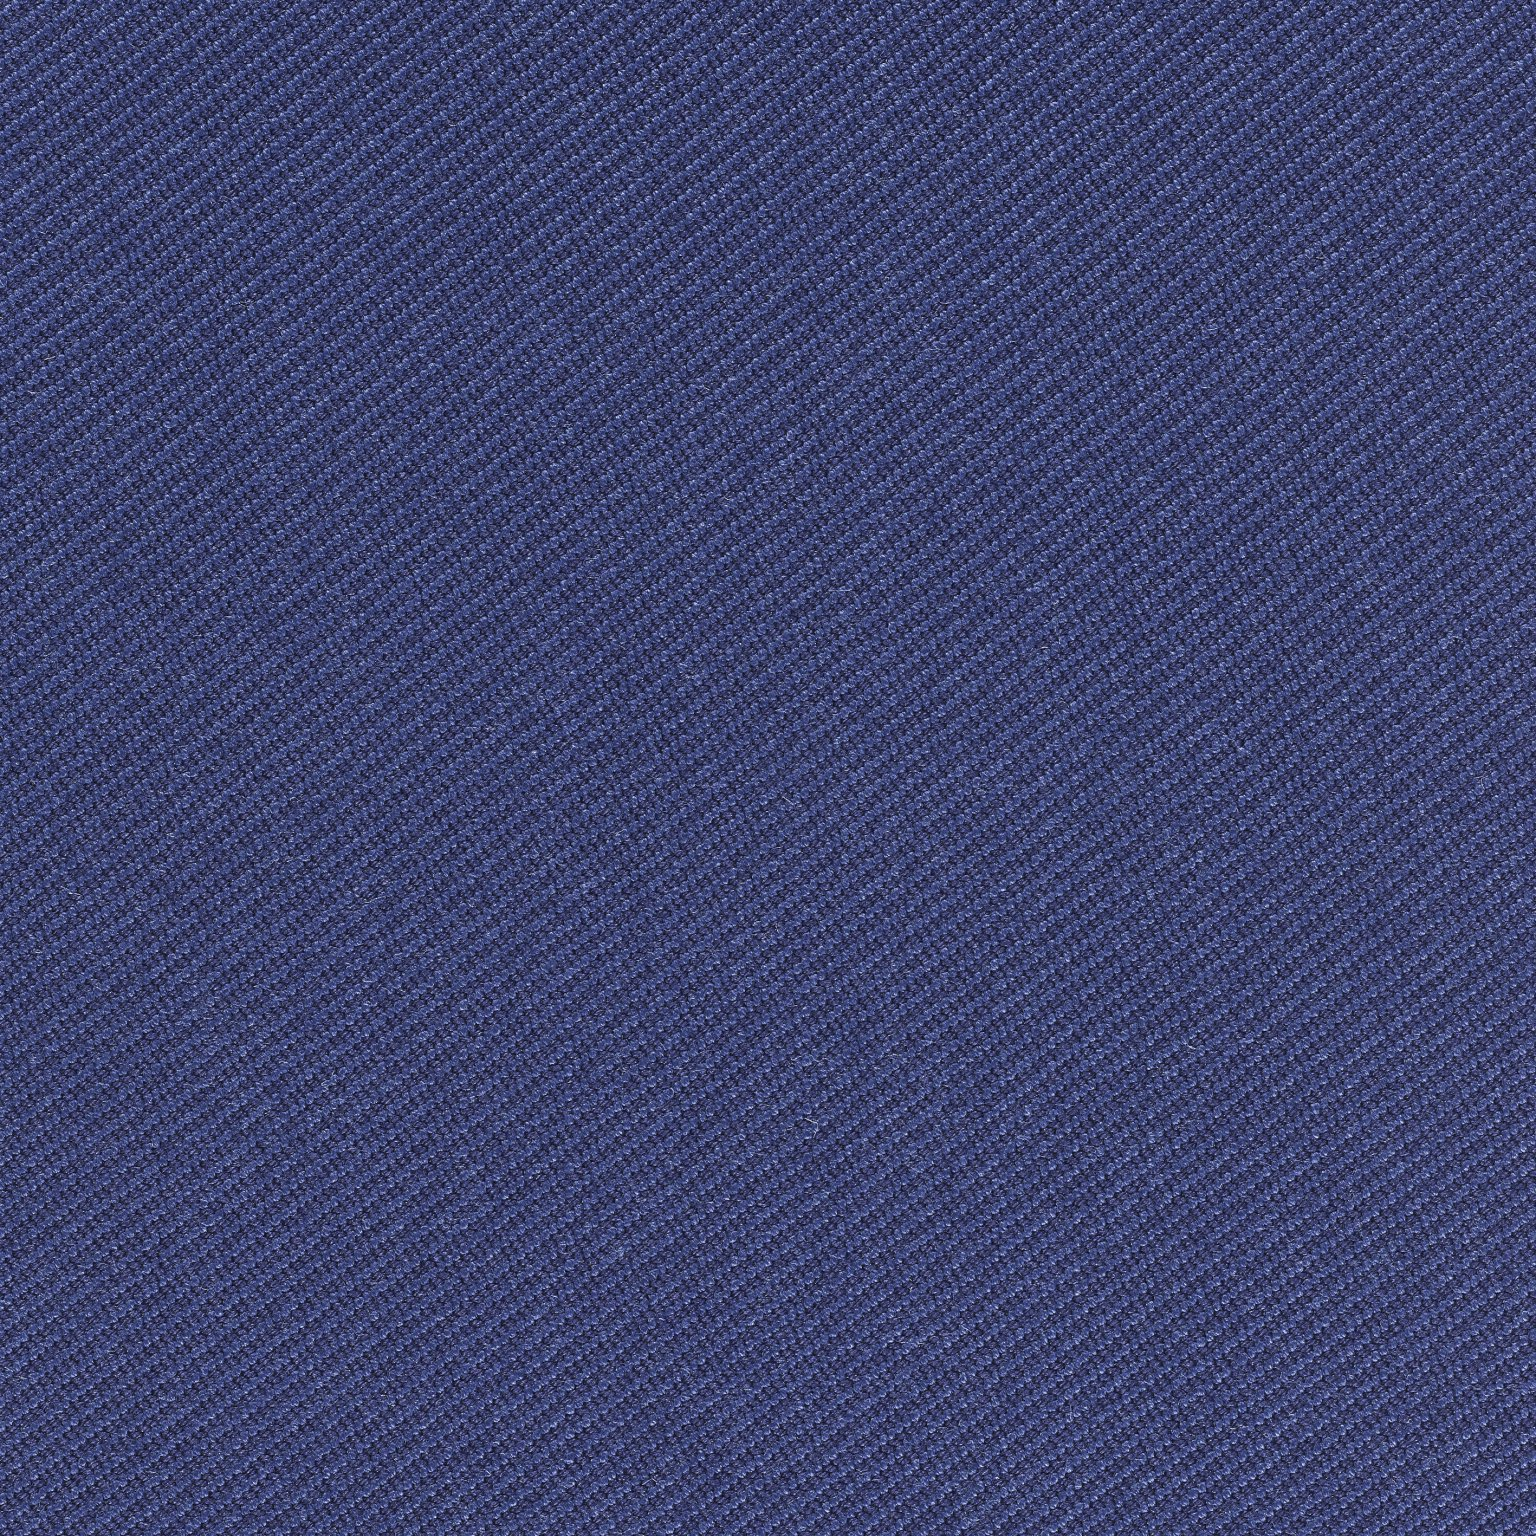 Kvadrat > Twill Weave 0780